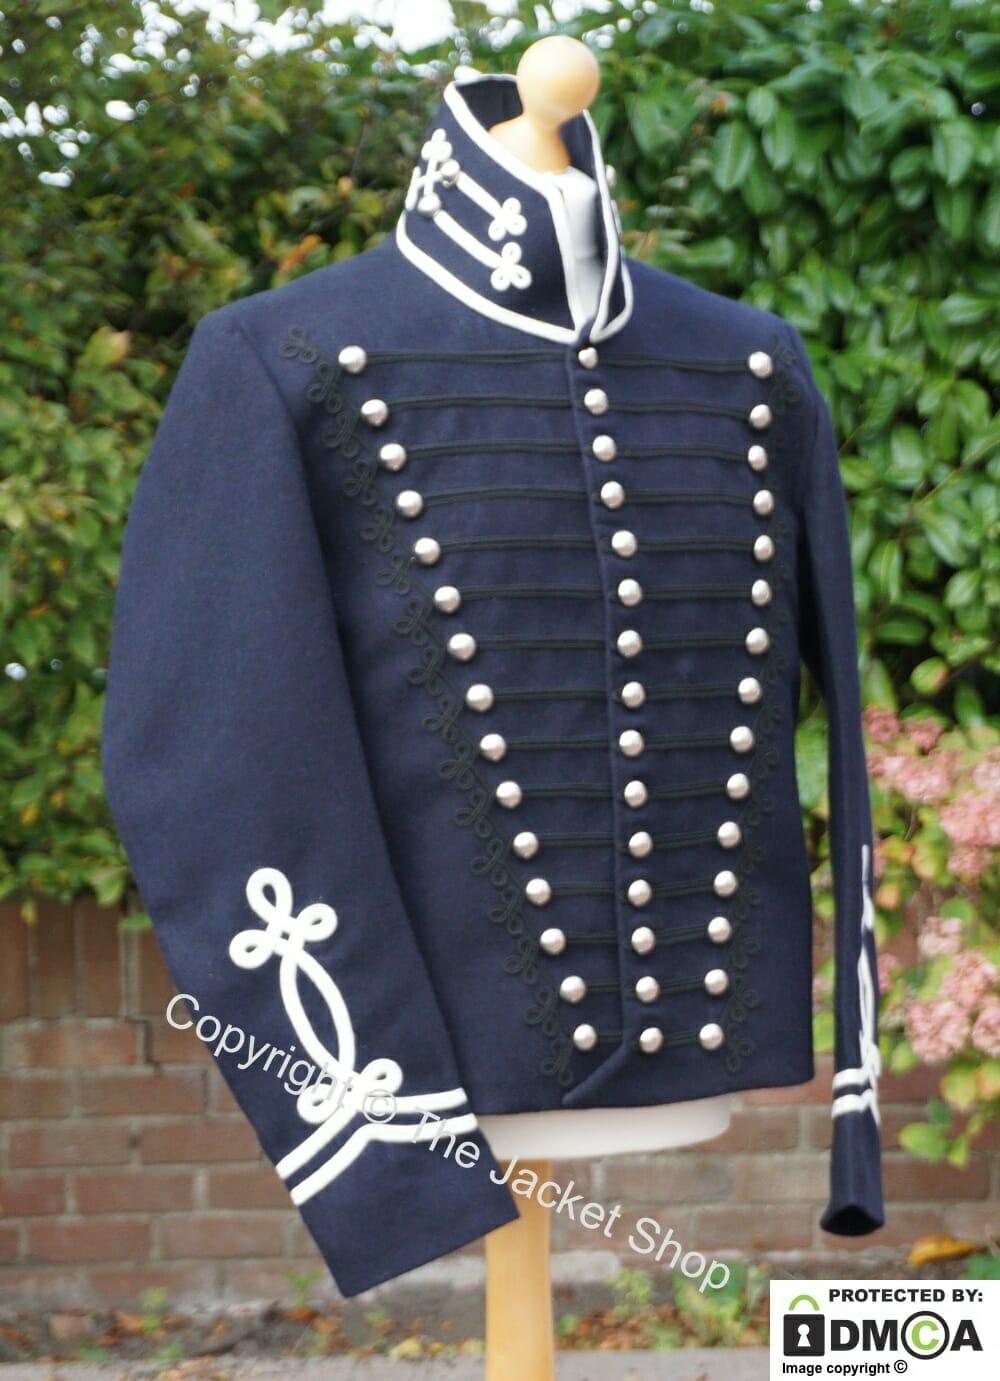 https://thejacketshop.co.uk/wp-content/uploads/2018/09/products-US-Dragoon-War-military-812-coat-jacket-uniform.jpg